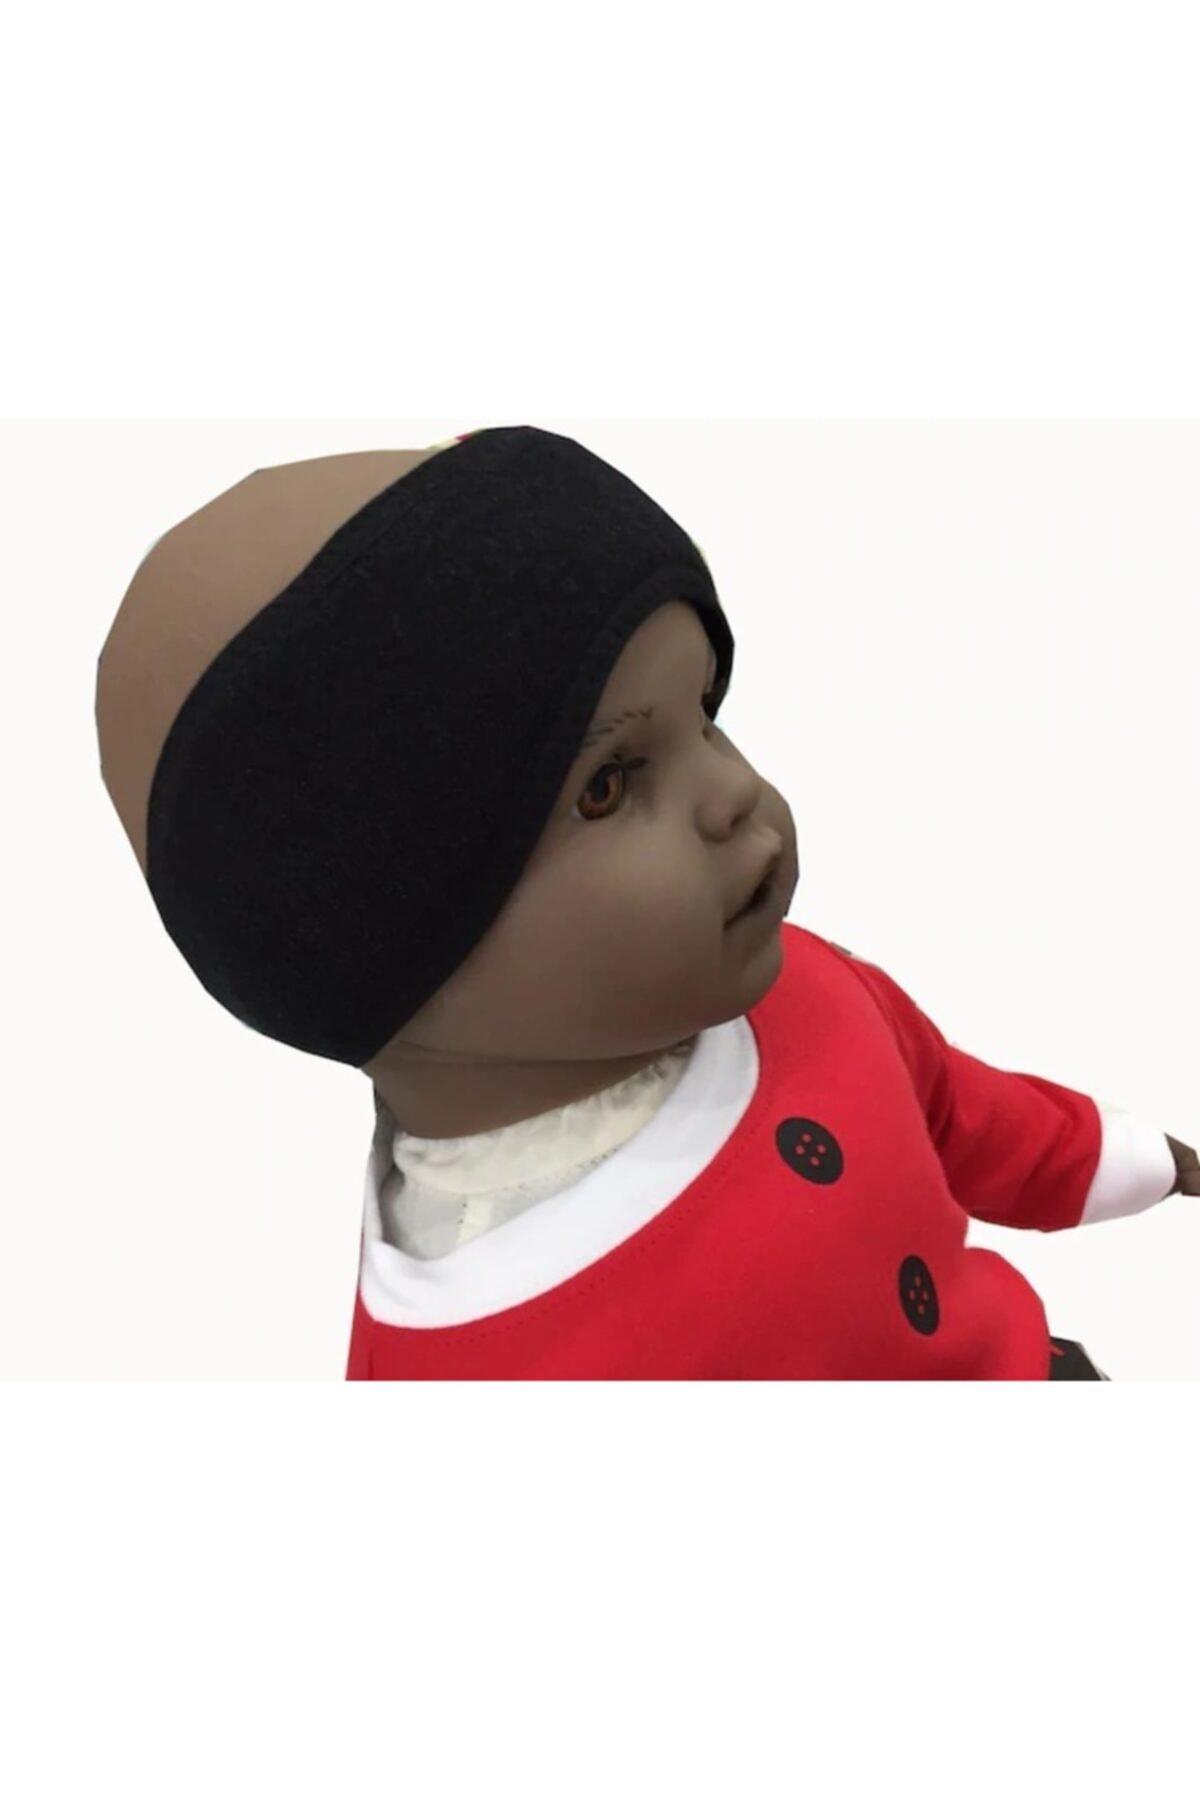 Ankara Medikal Kız Bebek Kepçe Kulak Bandı 0-2 Yaş 2